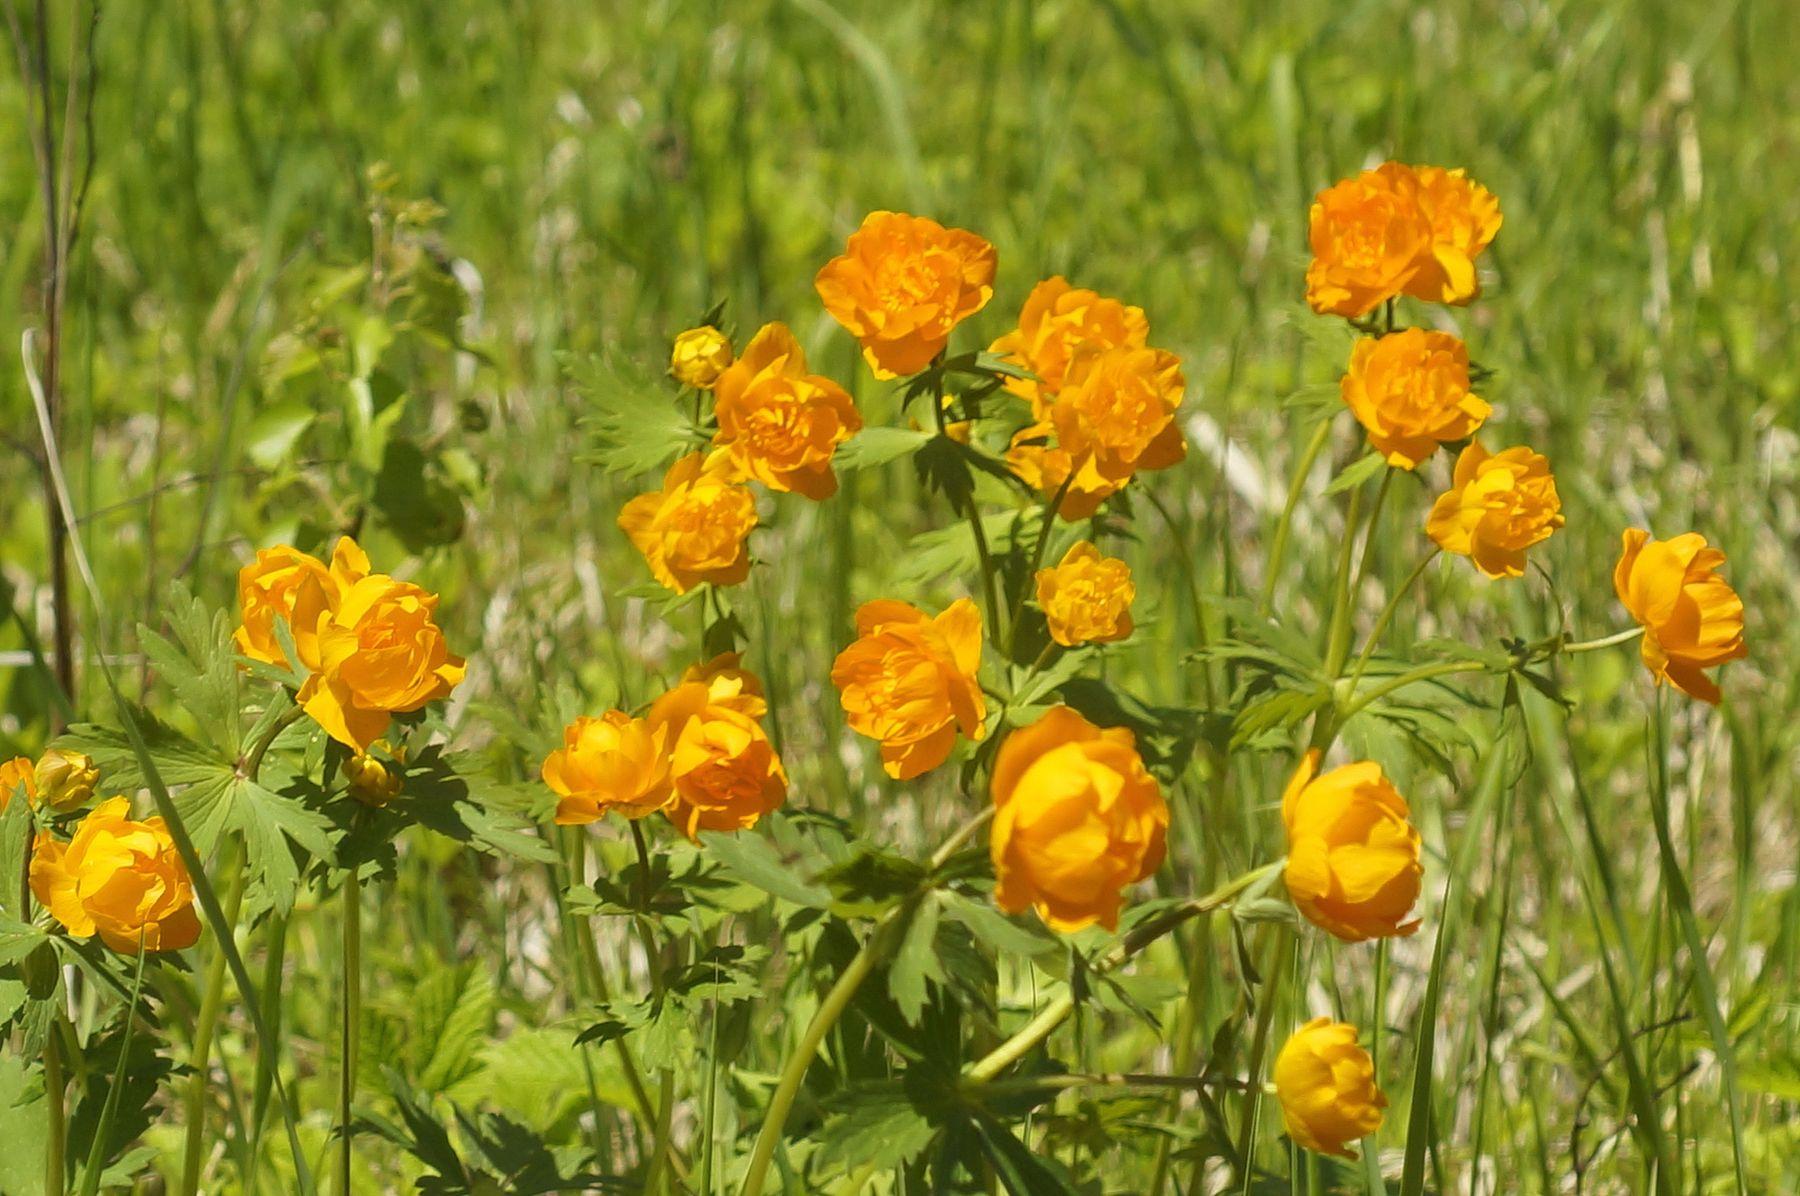 Жарки жарок цветы лето лес купальница азиатская